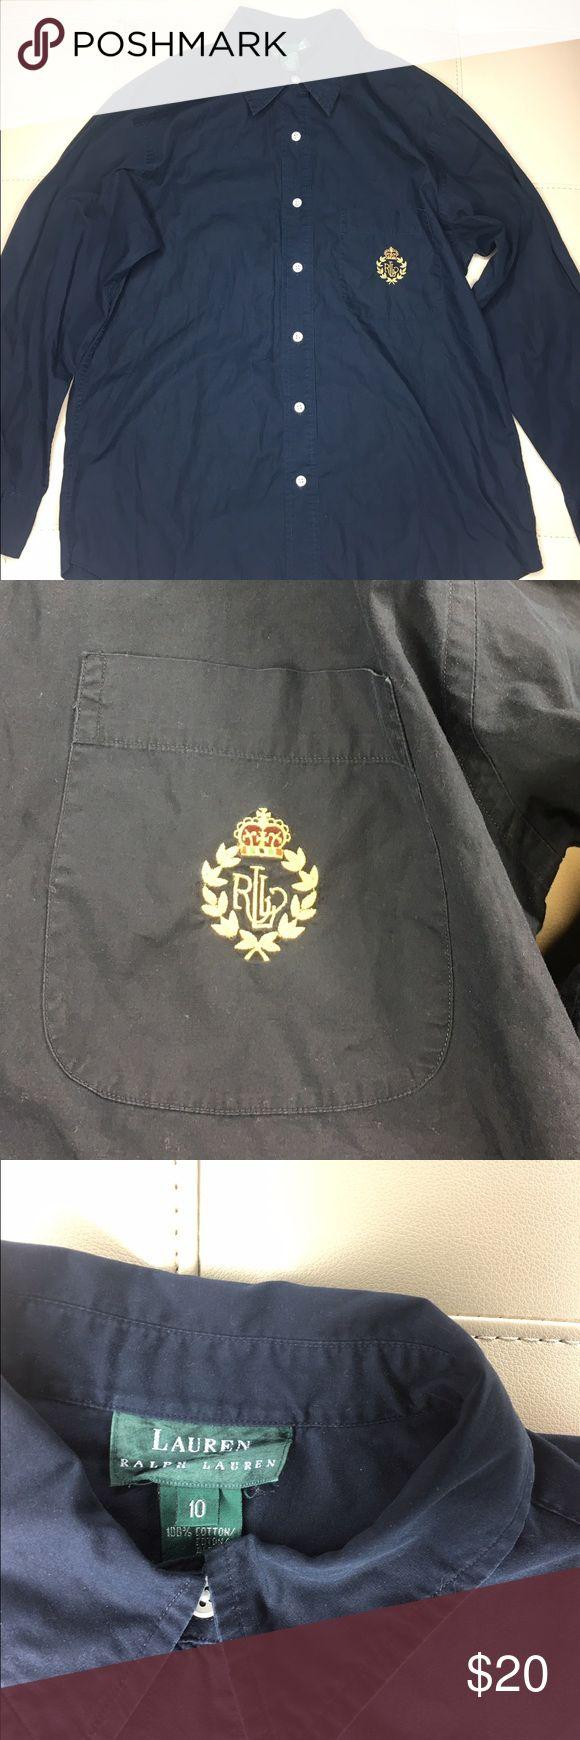 "Ralph Lauren women's dress shirt navy blue 🔴Ralph Lauren  🔴Navy Blue  🔴mint condition  🔴Unique emblem on chest  🔴pit to pit - 18.5"" 🔴Length - 28.5"" Ralph Lauren Tops Button Down Shirts"